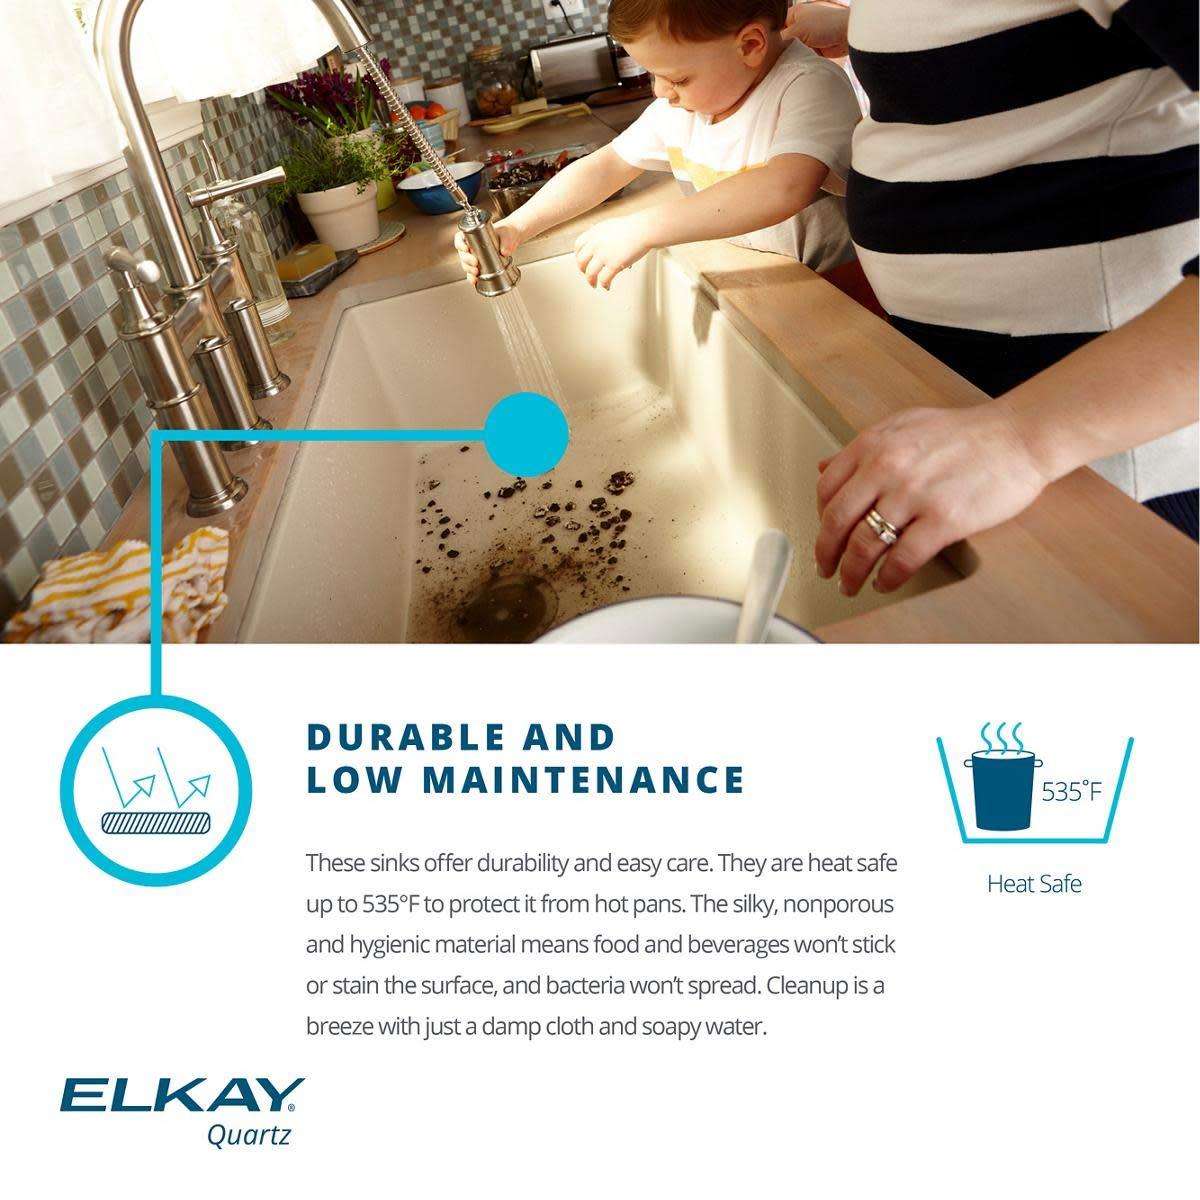 Elkay ELGU13322GR0 Quartz Classic Greige Single Bowl Undermount Sink